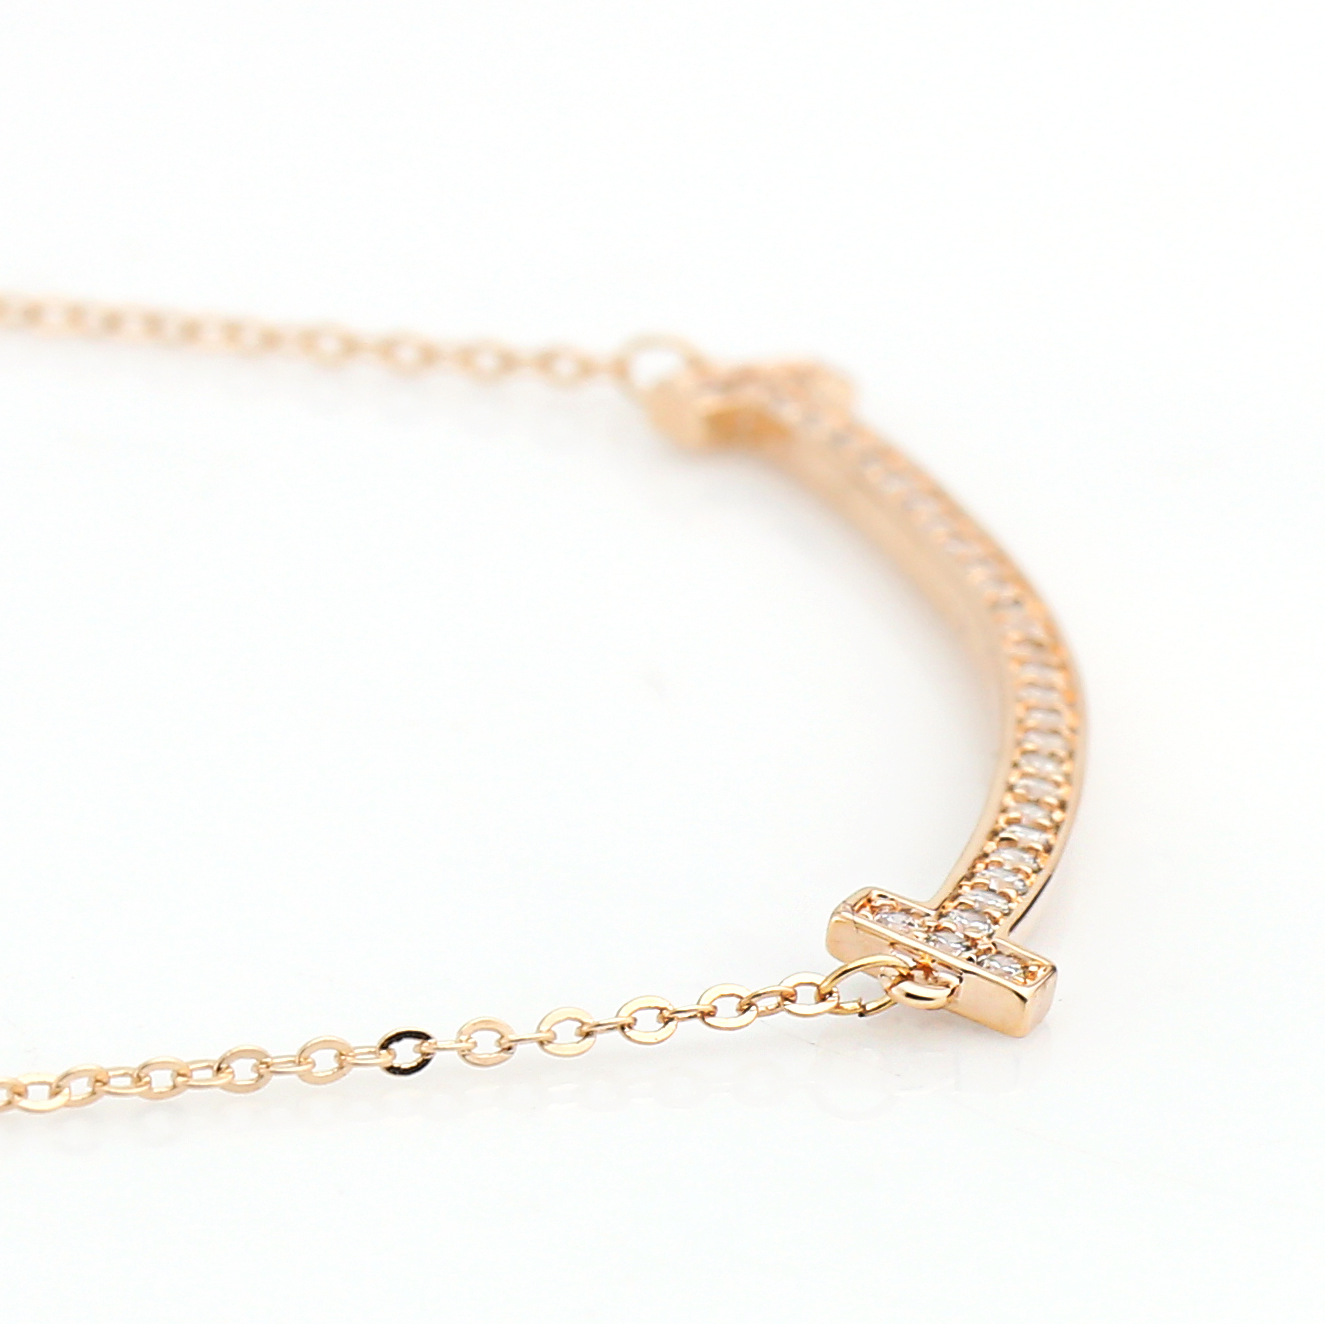 UE- Sleek Rose Tone Designer Bar Necklace With Pave Set Swarovski Style Crystals image 3